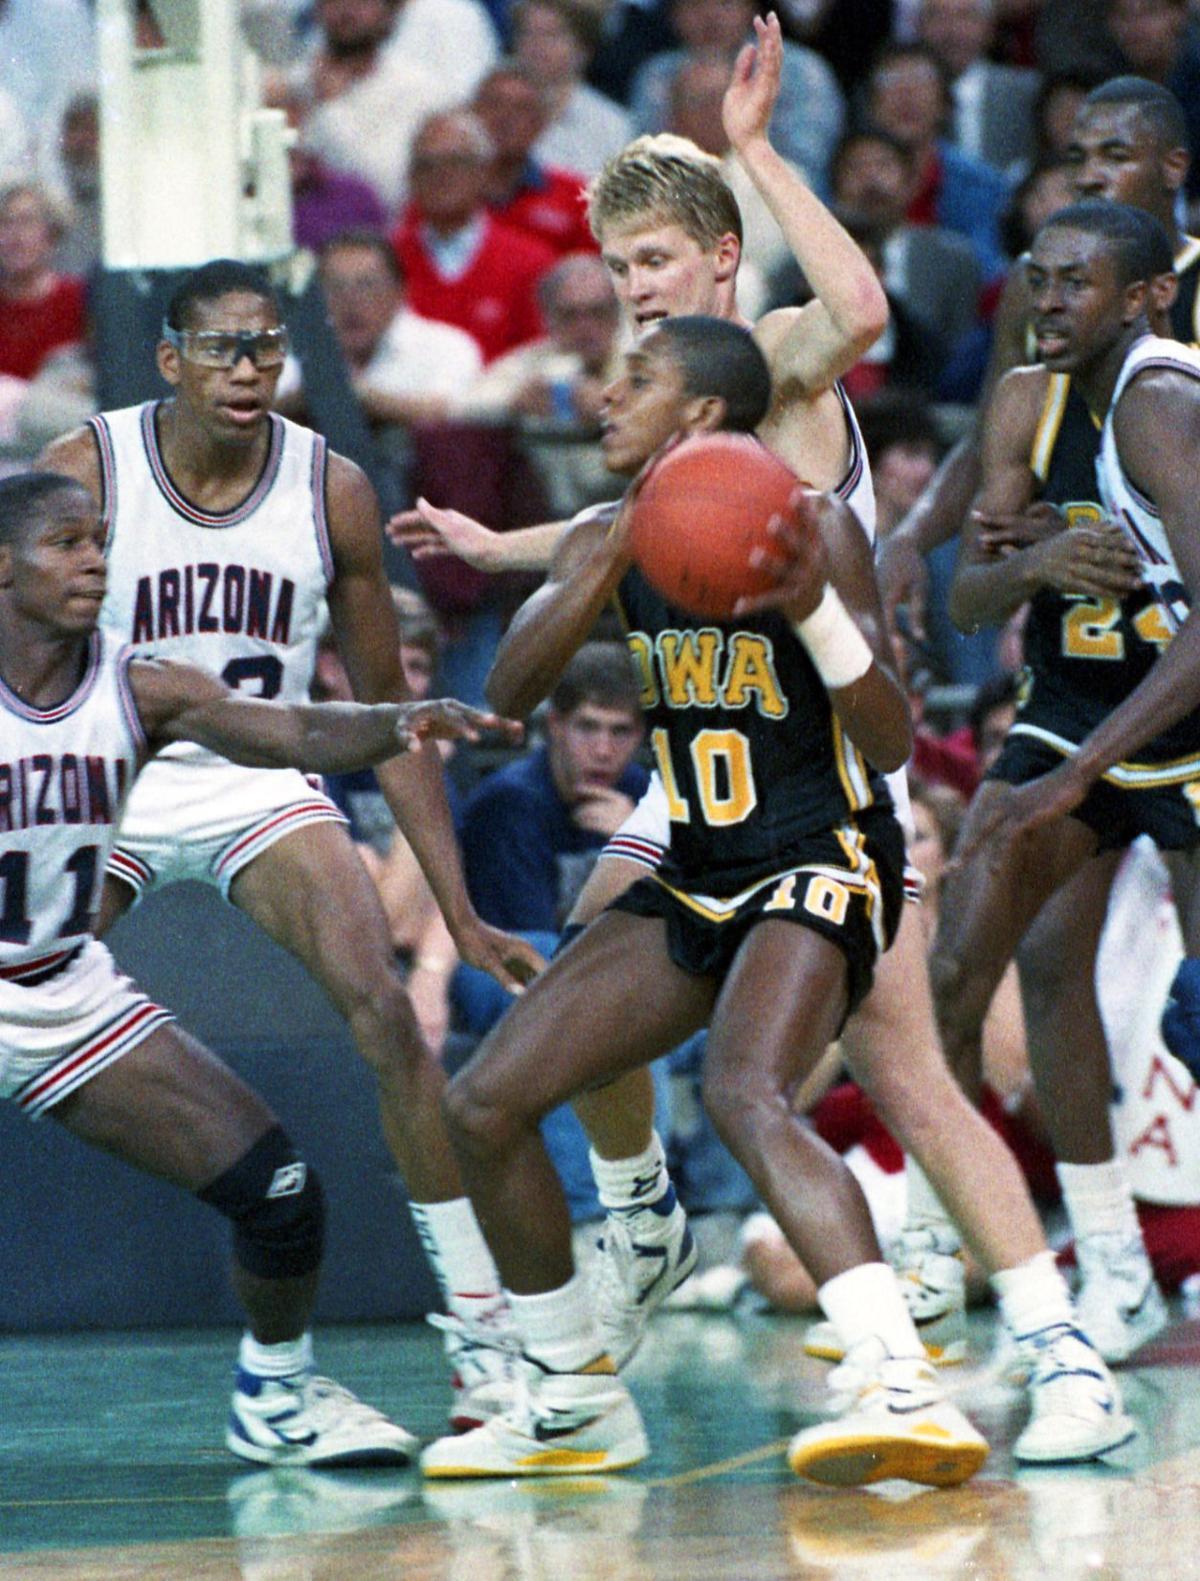 1. Arizona 66, Iowa 59, December 1987